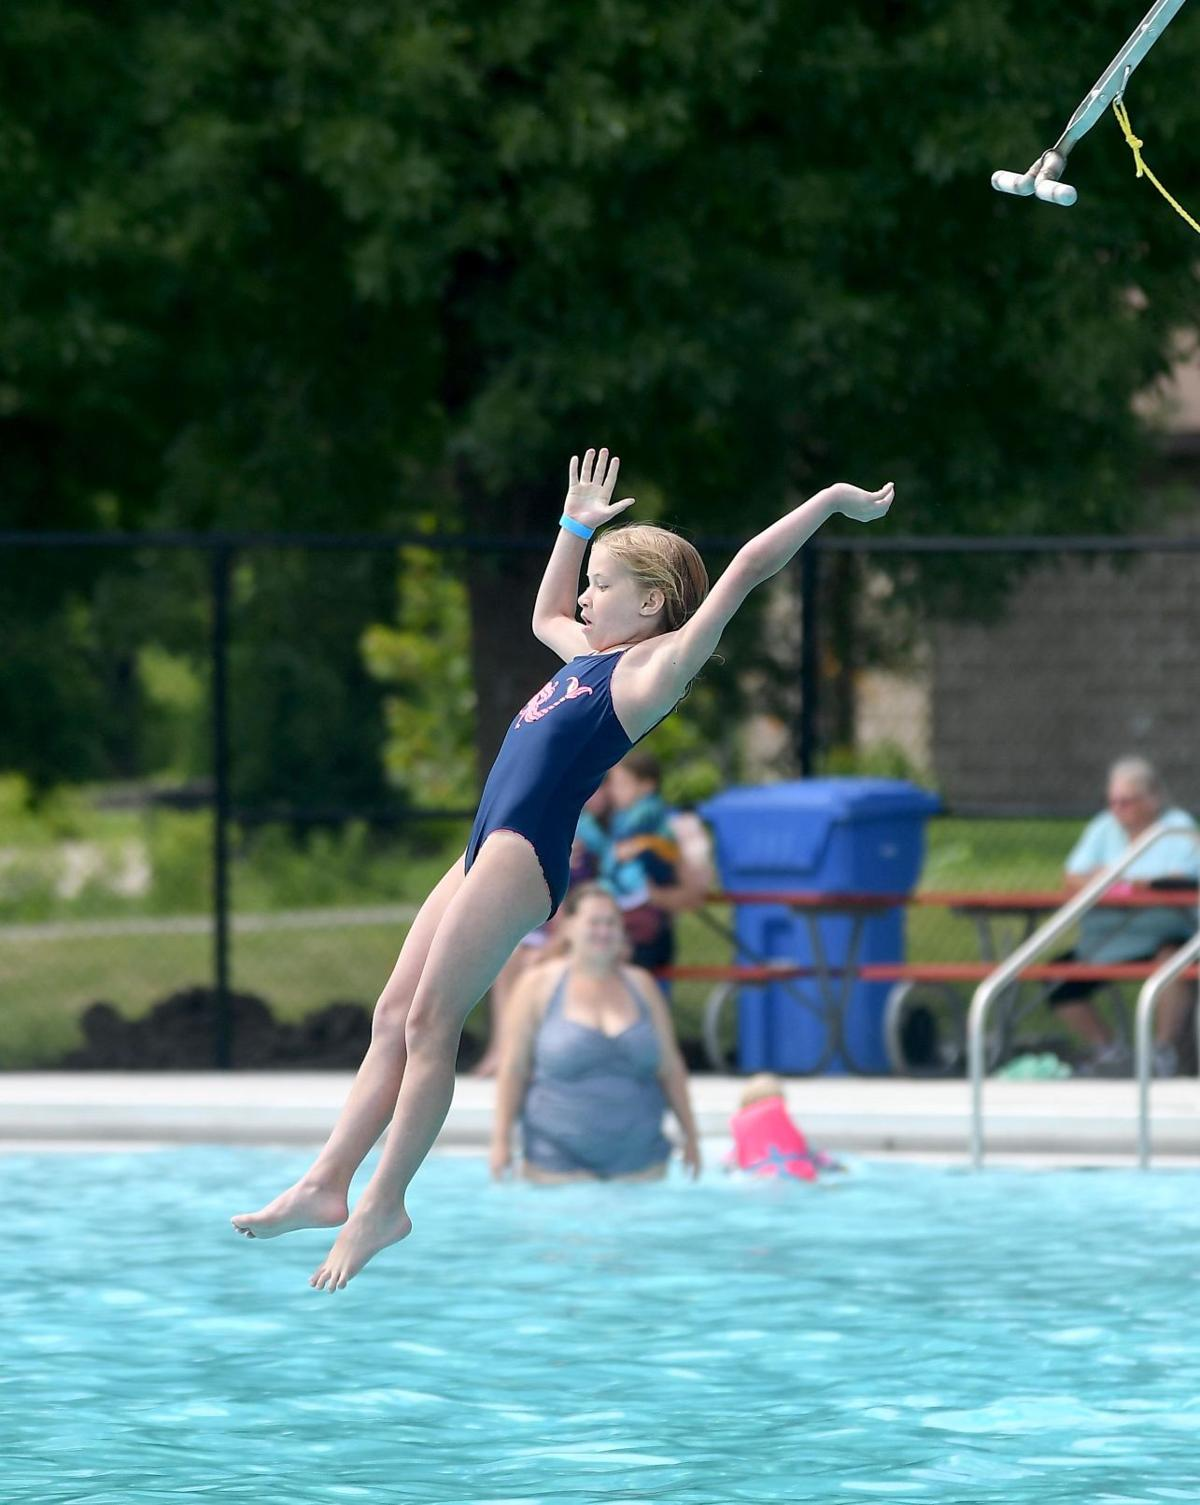 Spring Lake Park pool opens 3